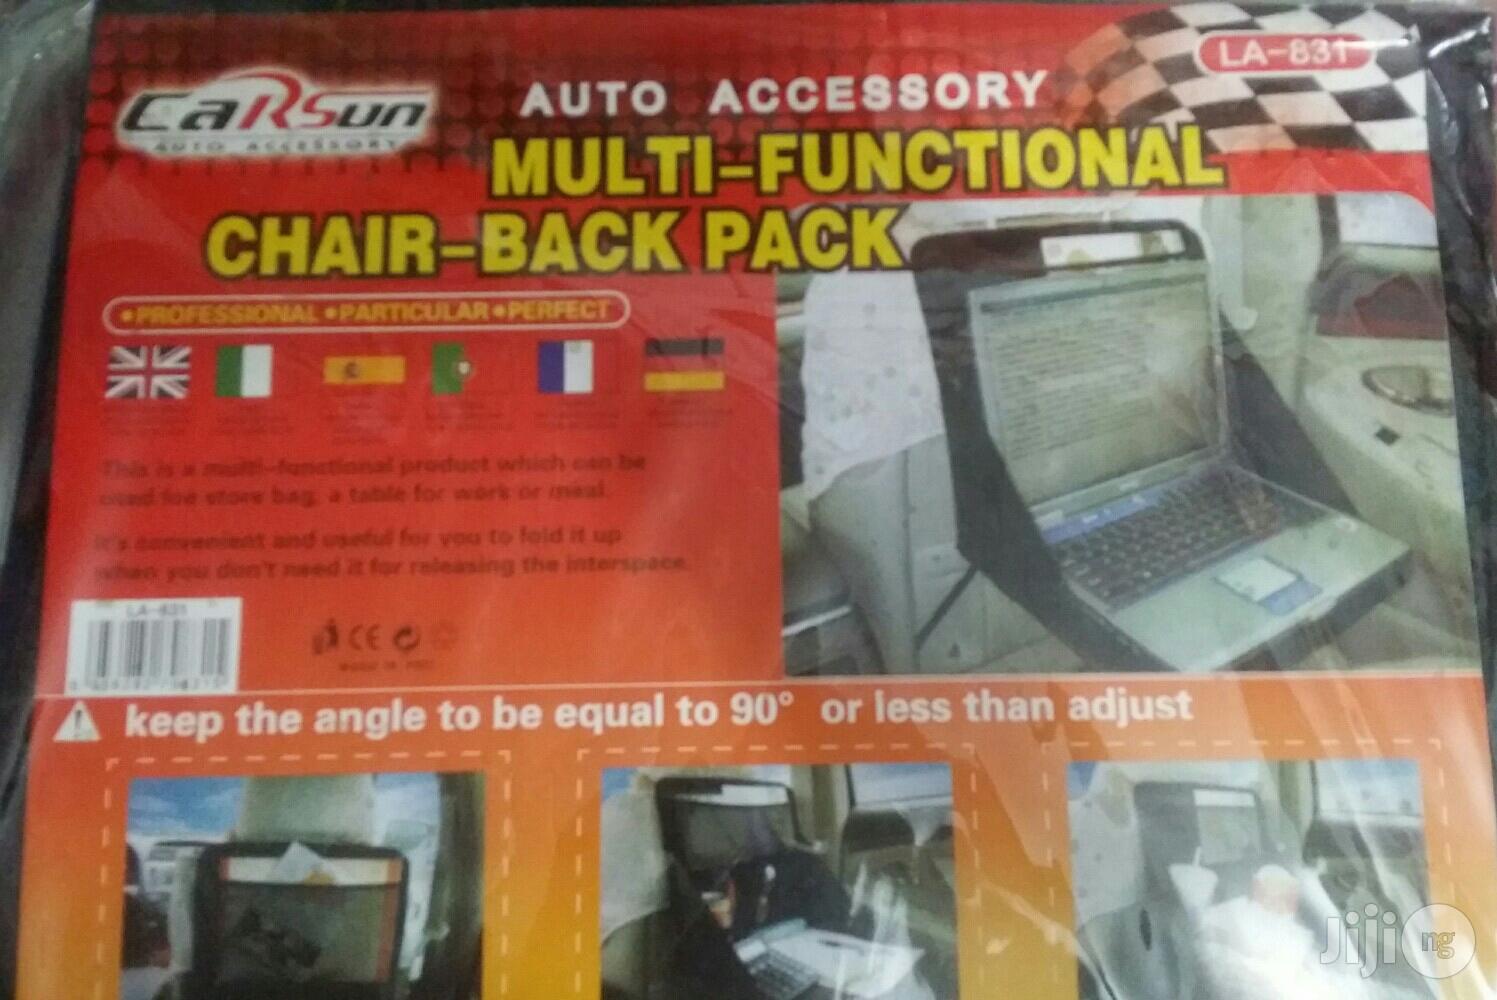 Multipurpose Laptop/Chair Back Pack